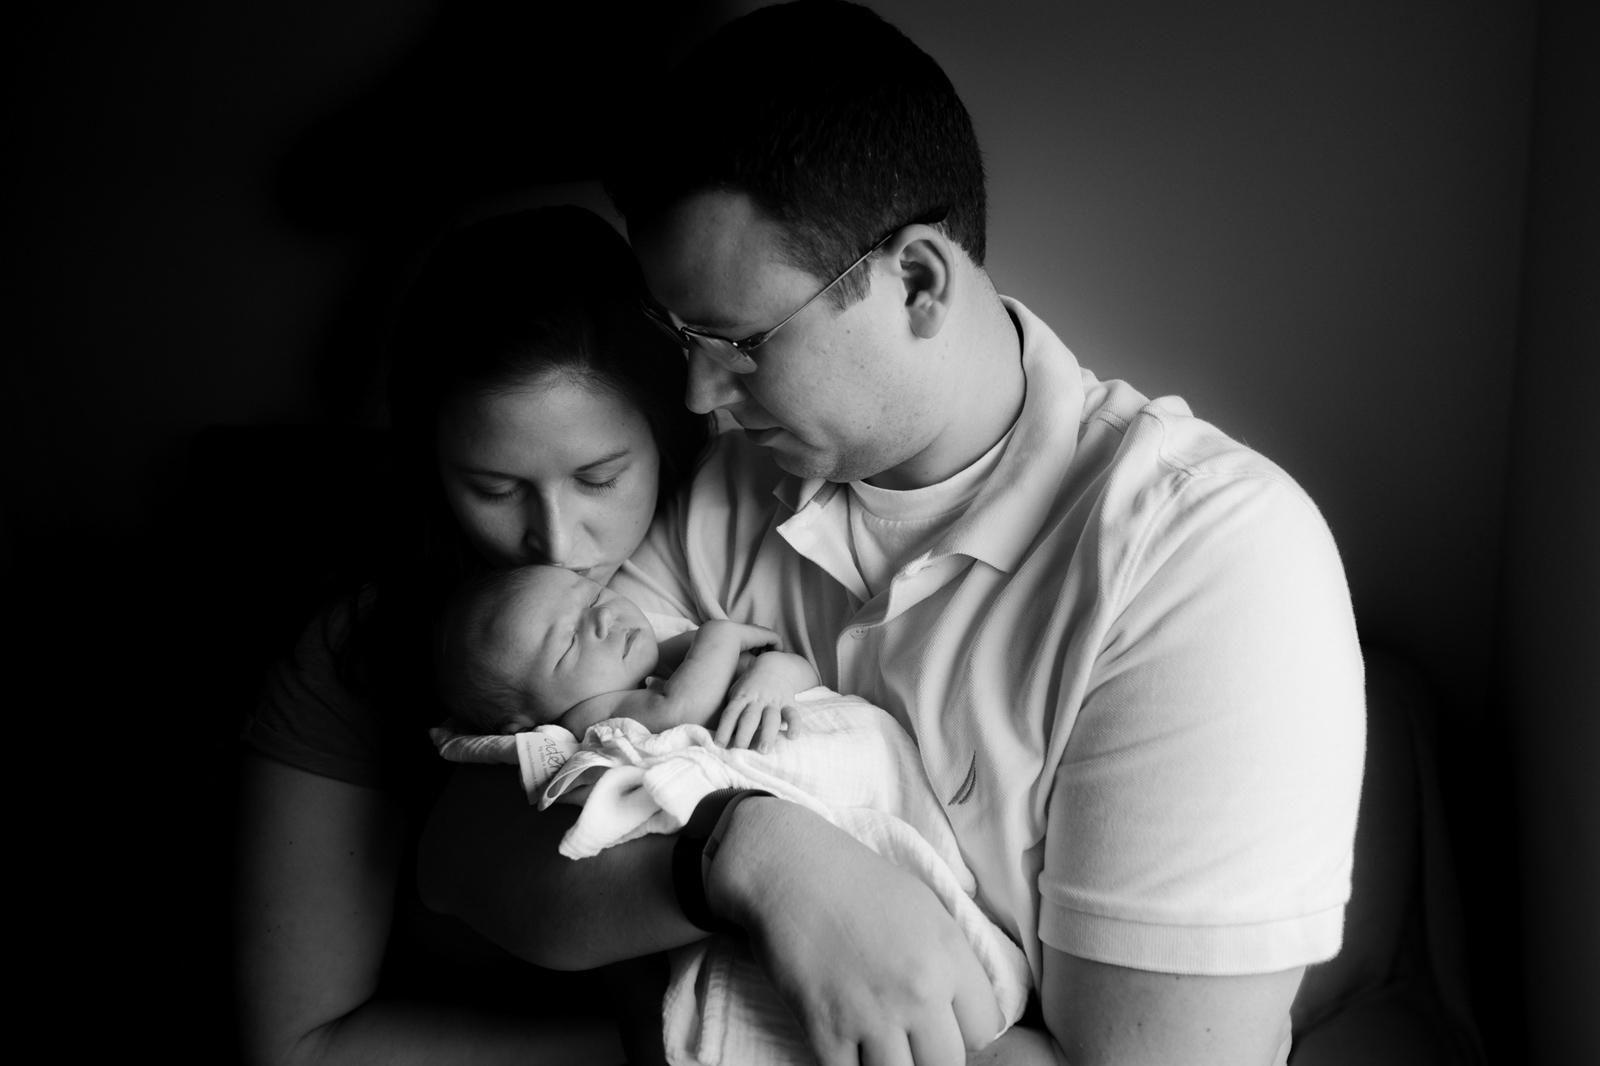 family photo with newborn by Sarah Rypma